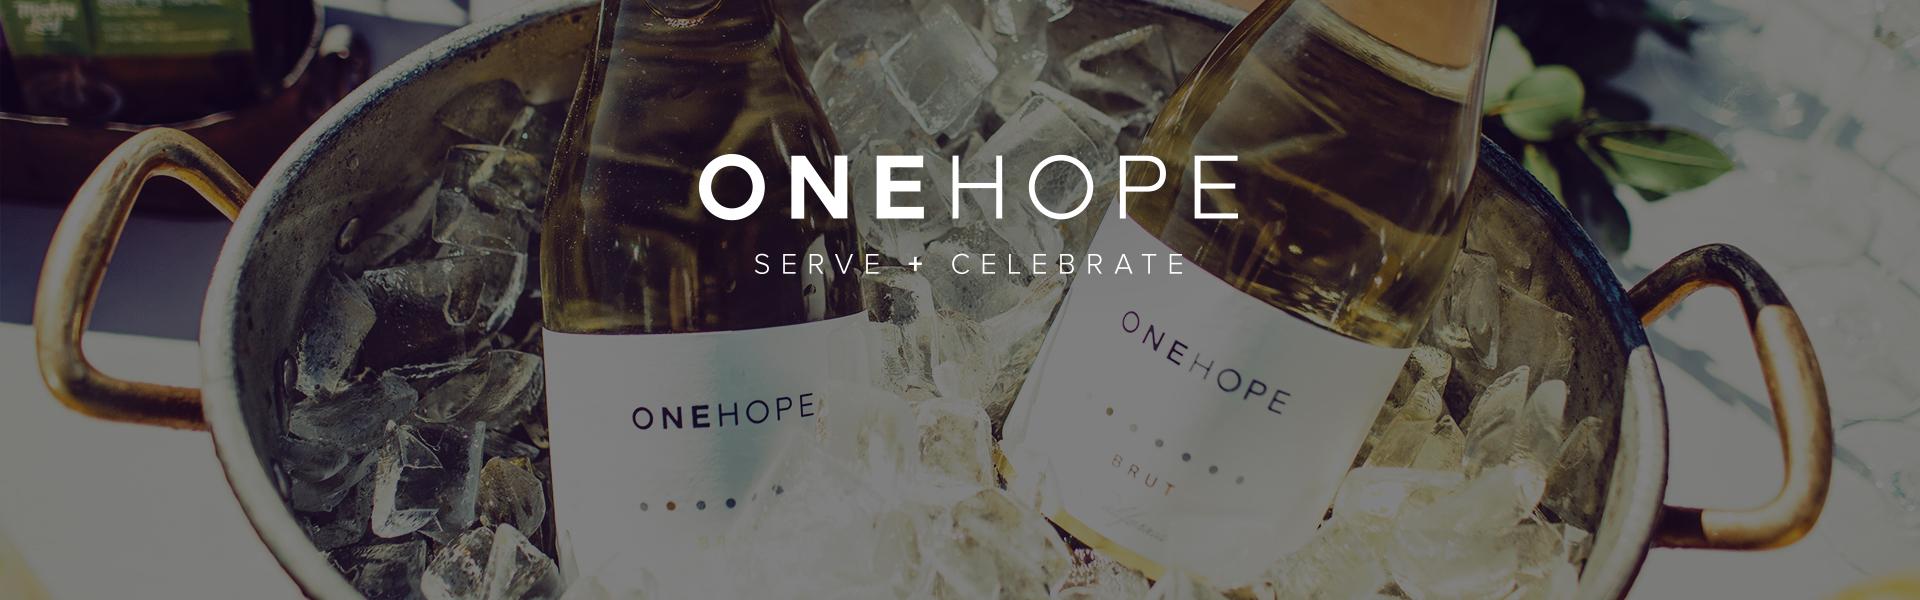 ONEHOPE Wine | Buy Inspired & Award-Winning Wine, Gift Boxes